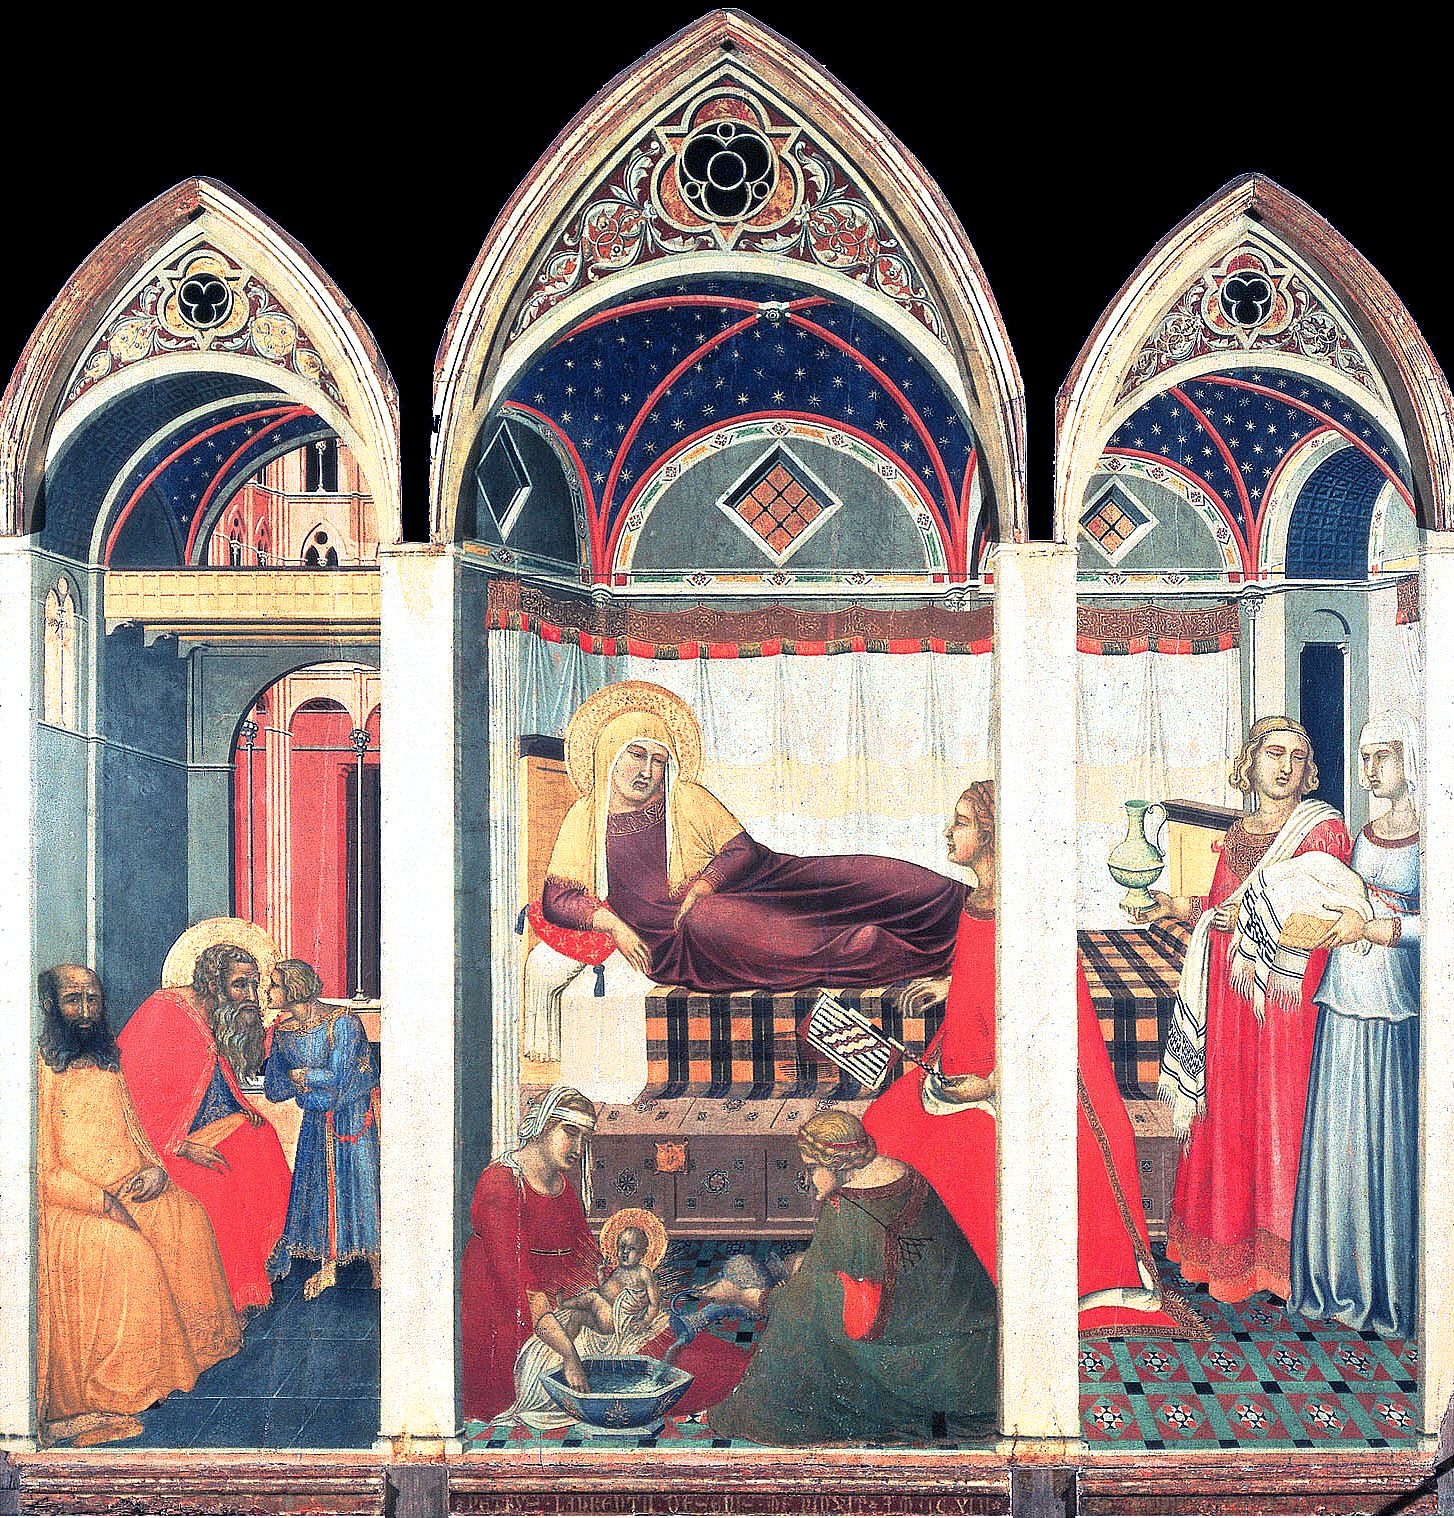 Pietro Lorenzetti - Birth of the Virgin 1c [1342] - Siena cathedral ...